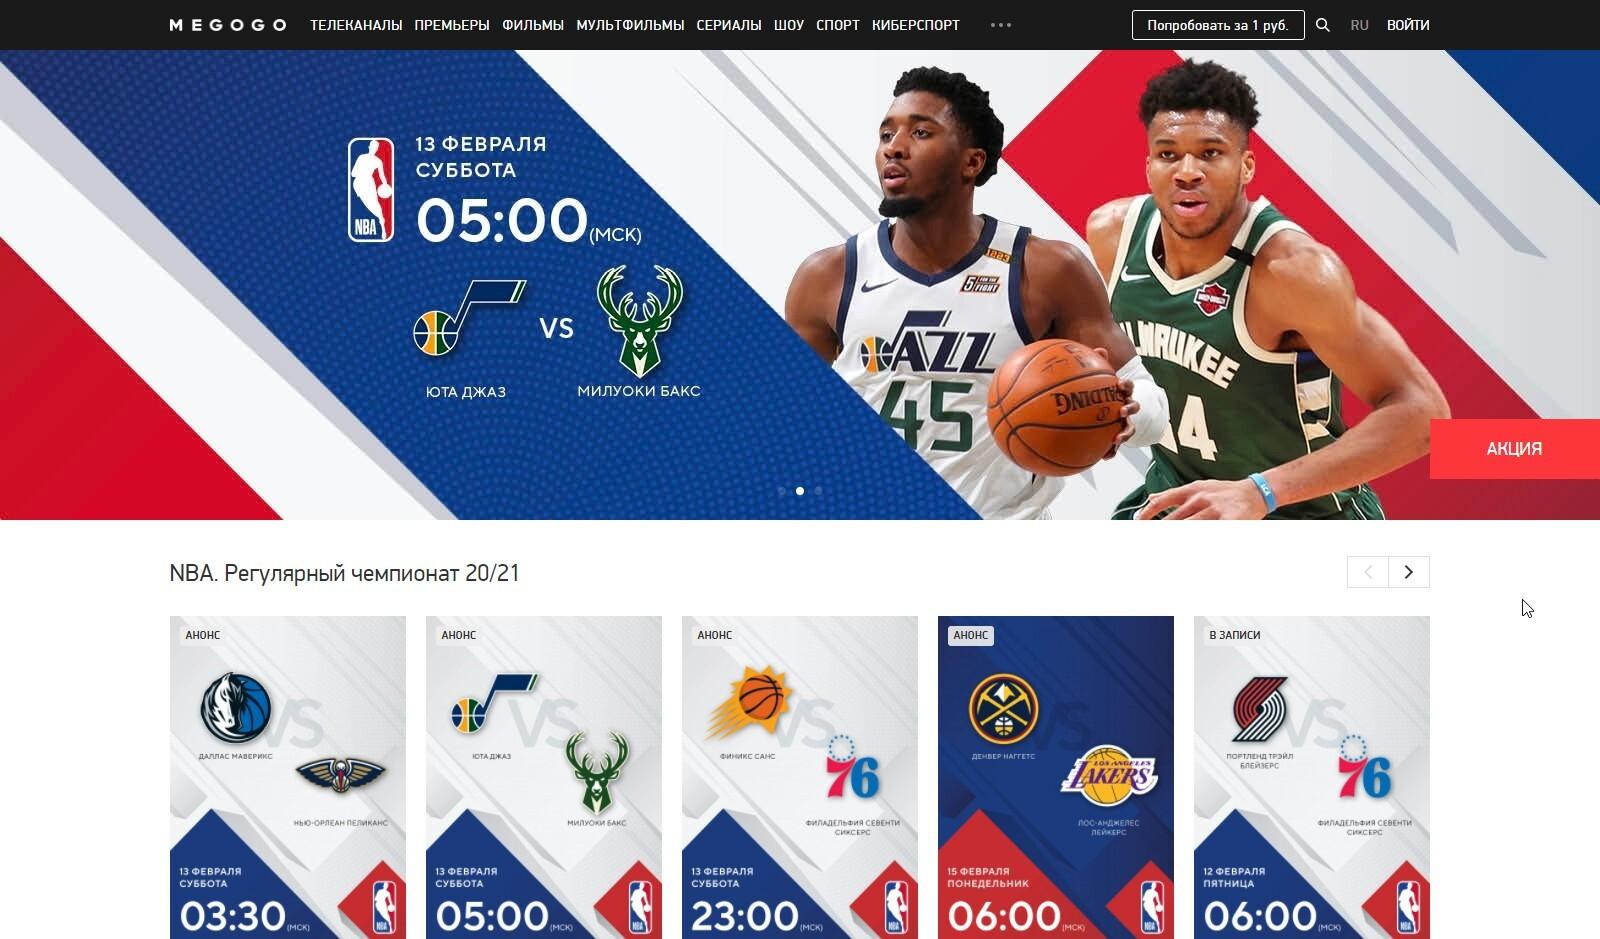 Страница NBA на сайте Megogo